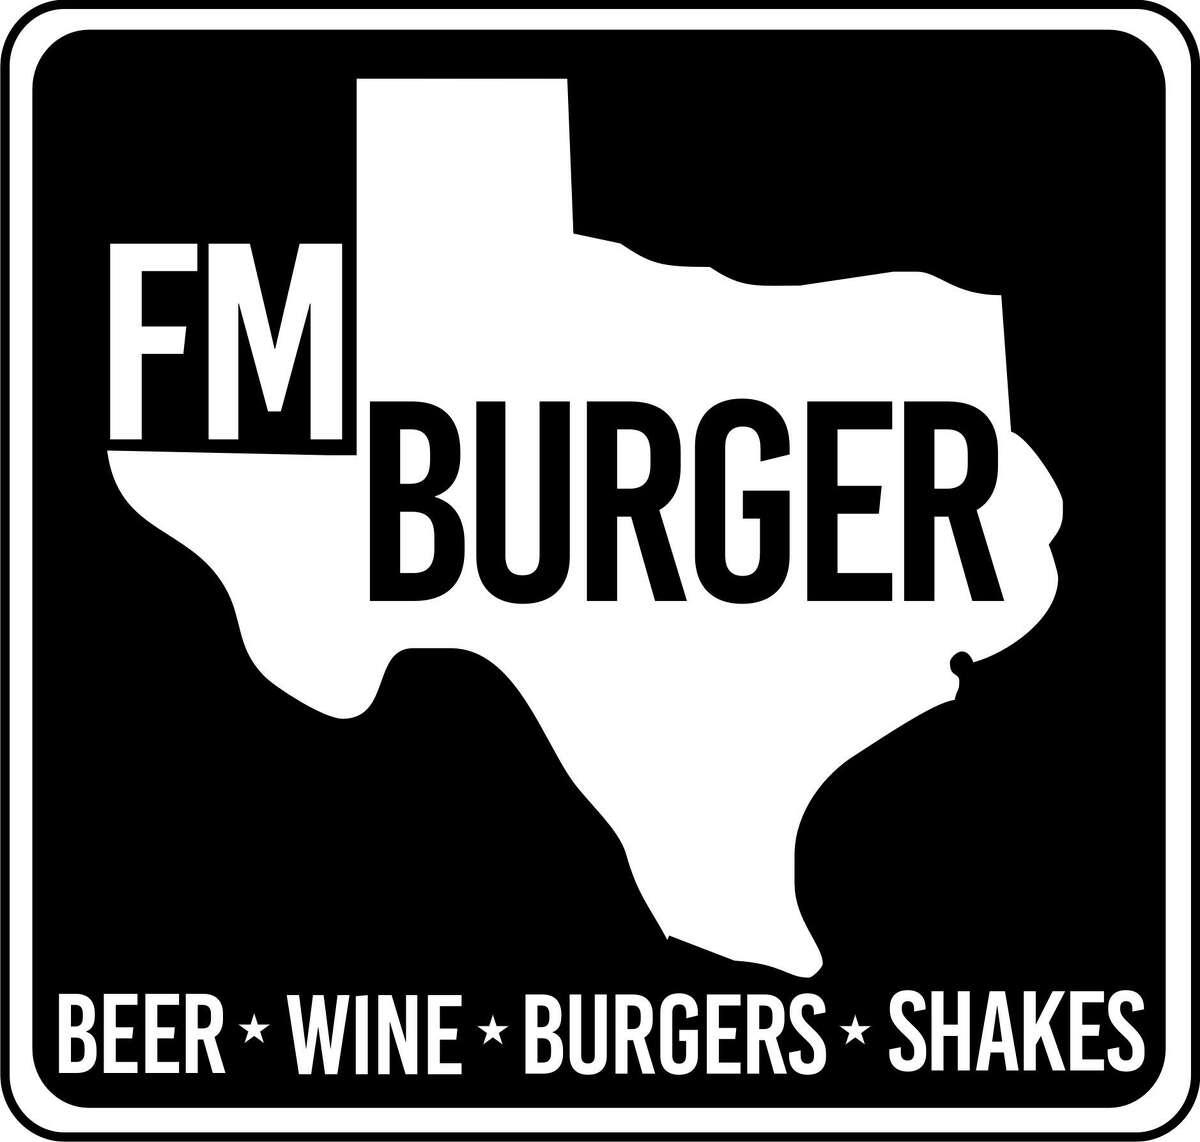 The logo for FM Burber, a new burger restaurant at 1112 Shepherd from chef Ryan Hildebrand and partner Chong Yi of Triniti restaurant.